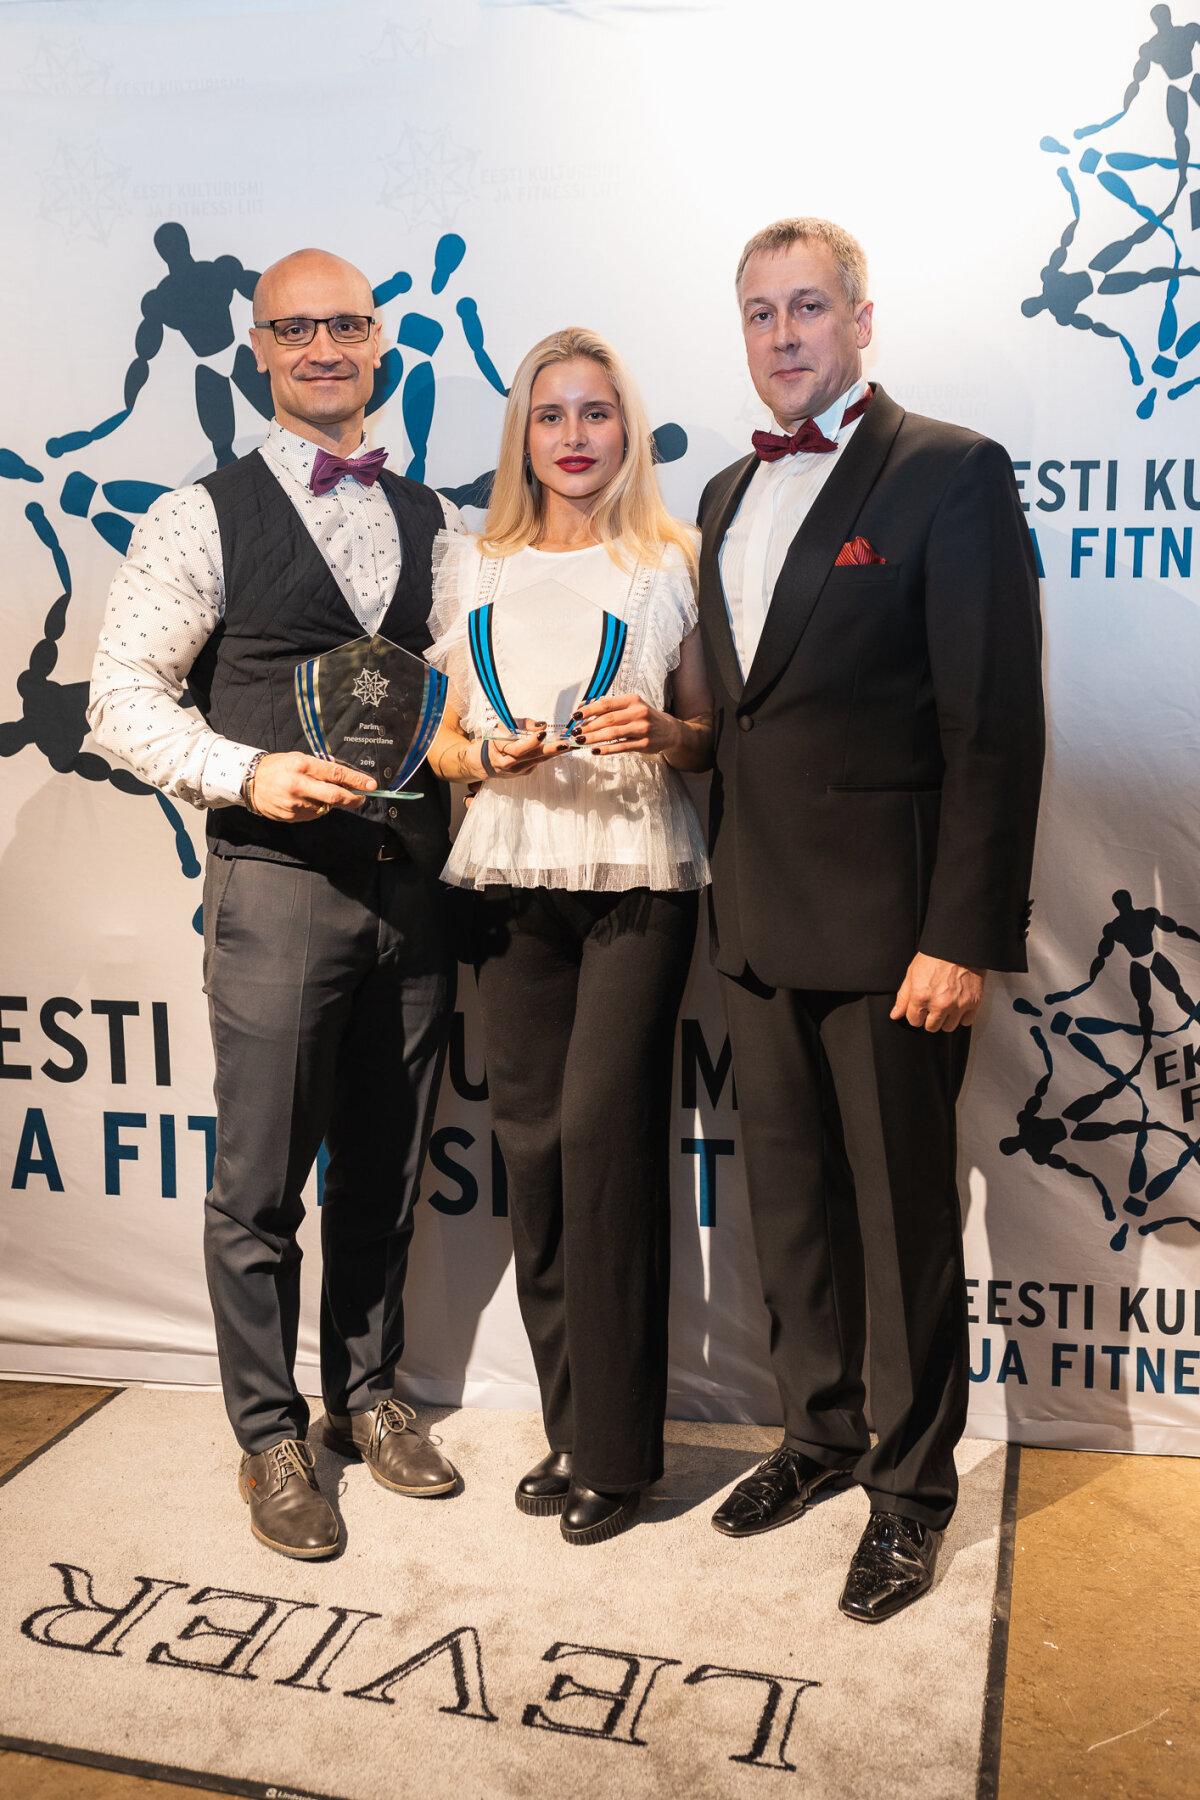 vasakult parim mees Ramil Lipp, parim naine Karina Polovnikova, EKFLi president Ergo Metsla